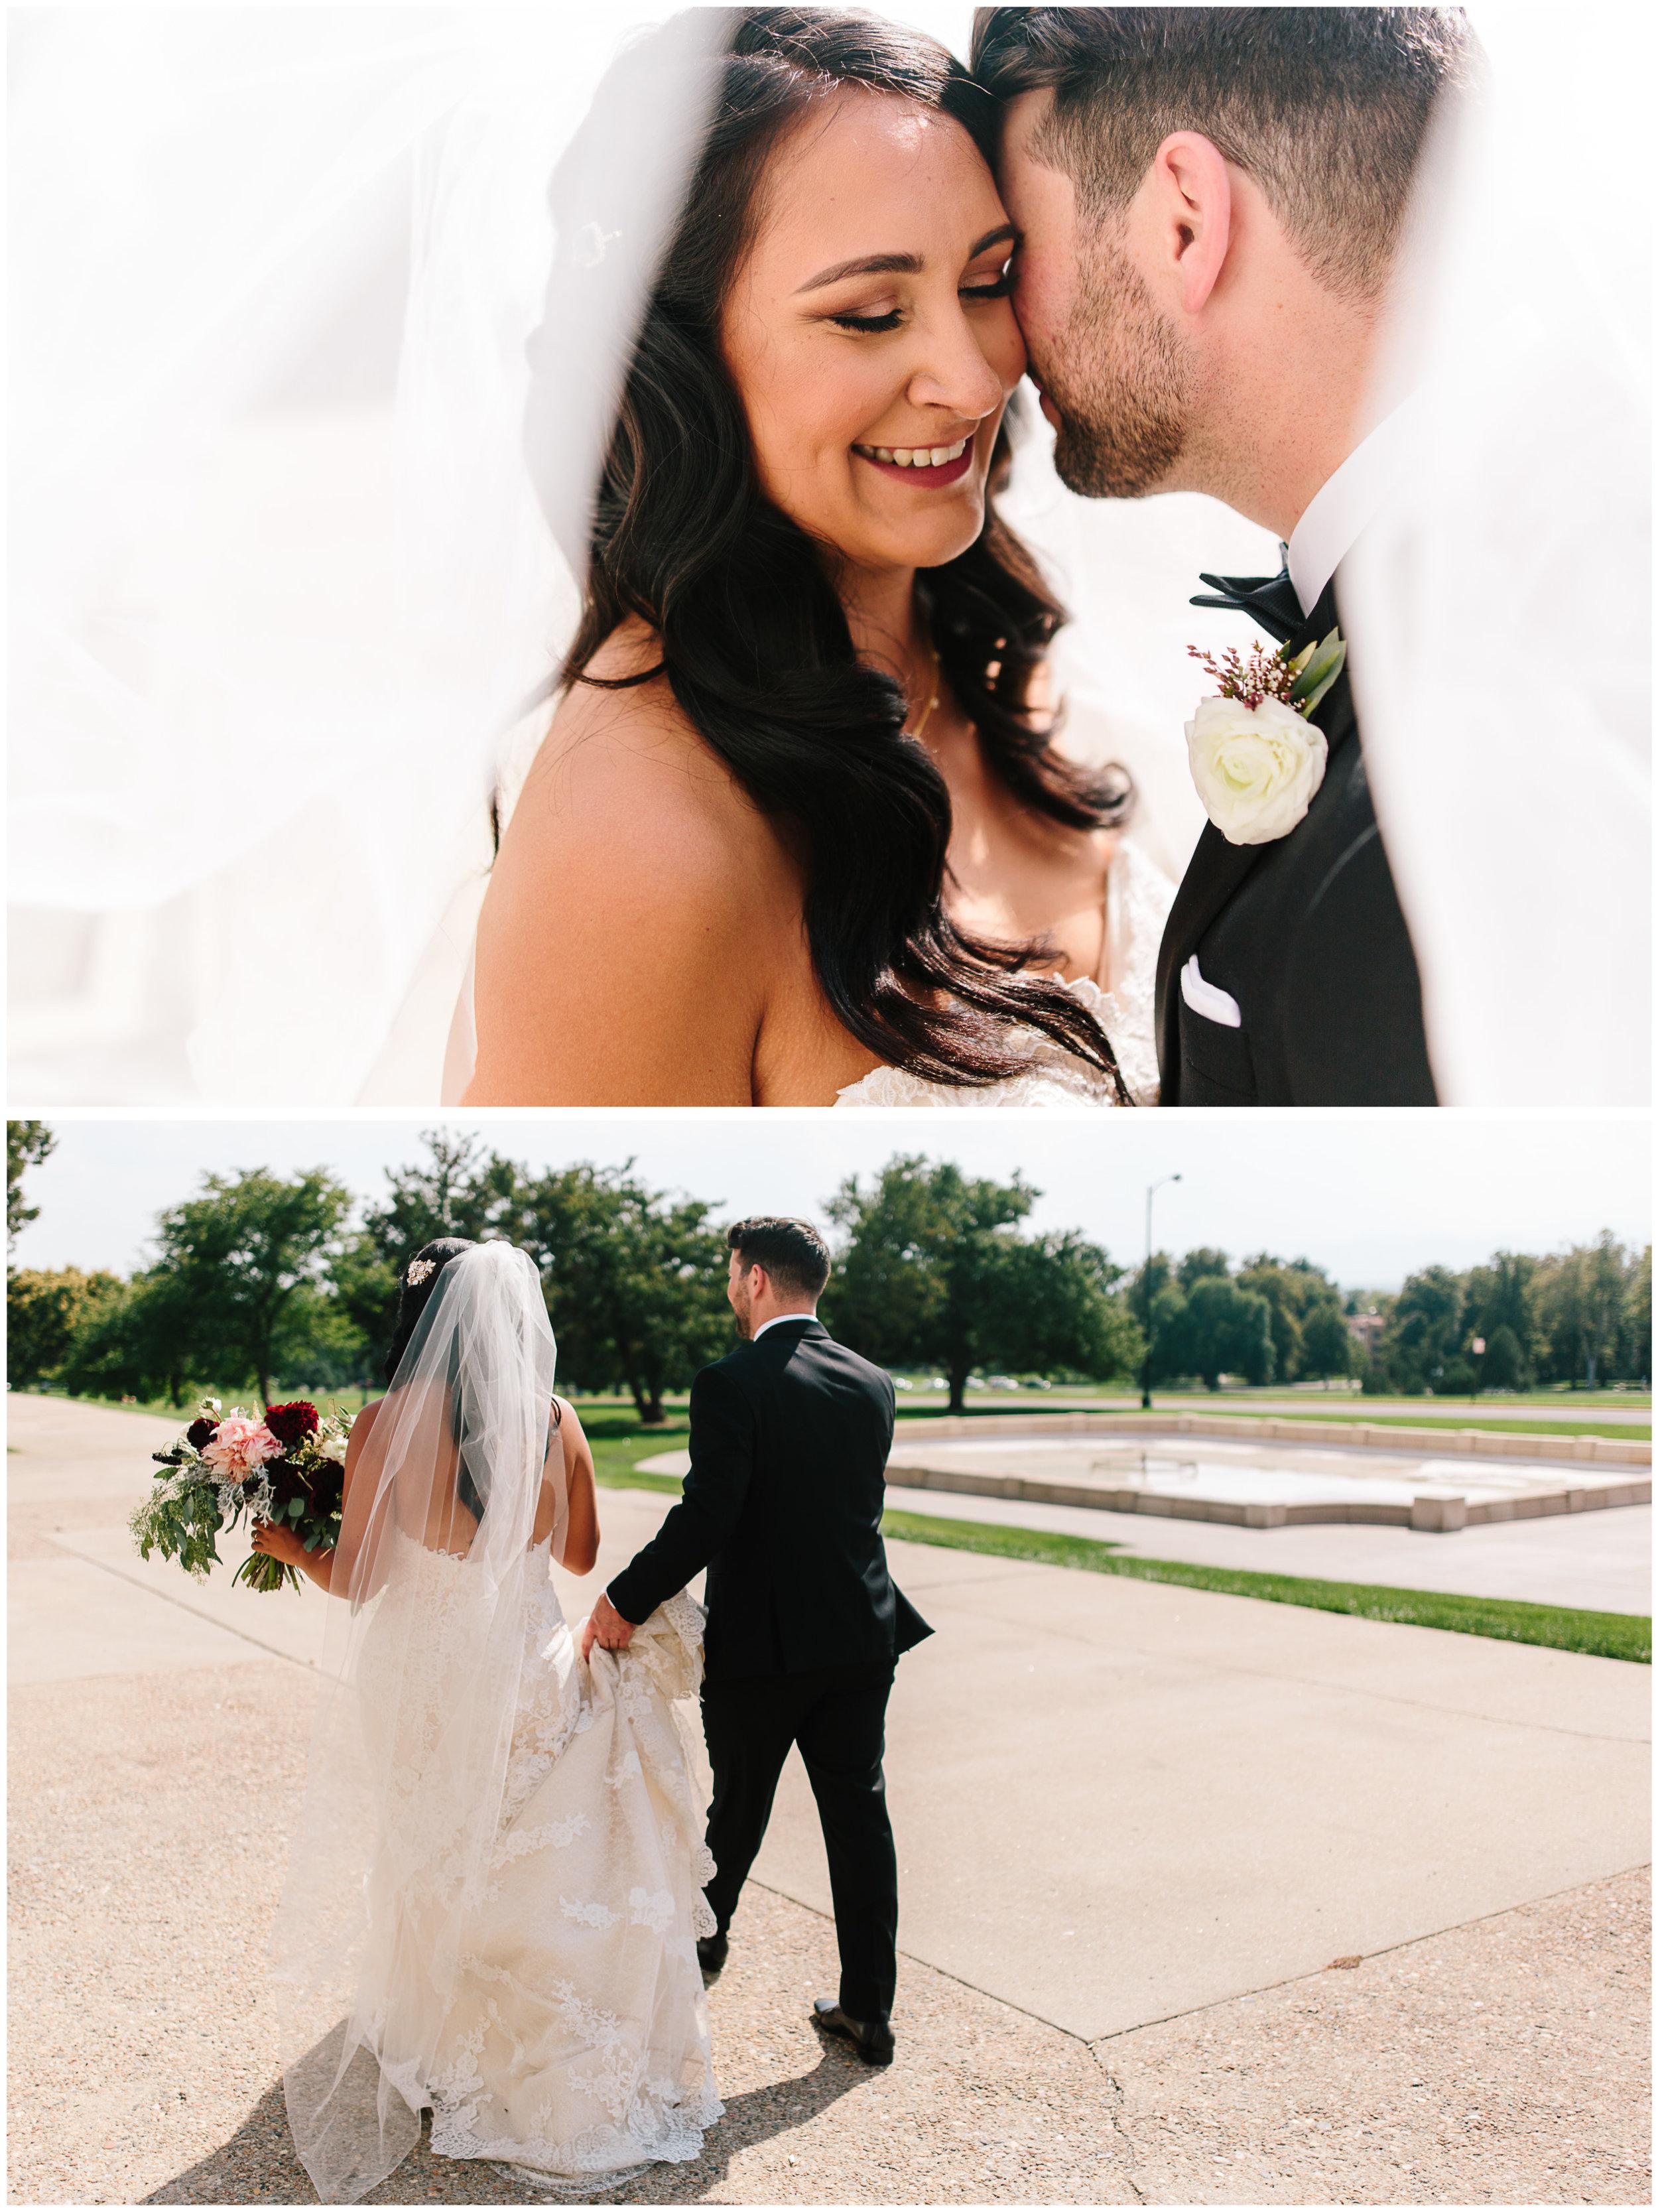 moss_denver_wedding_34.jpg